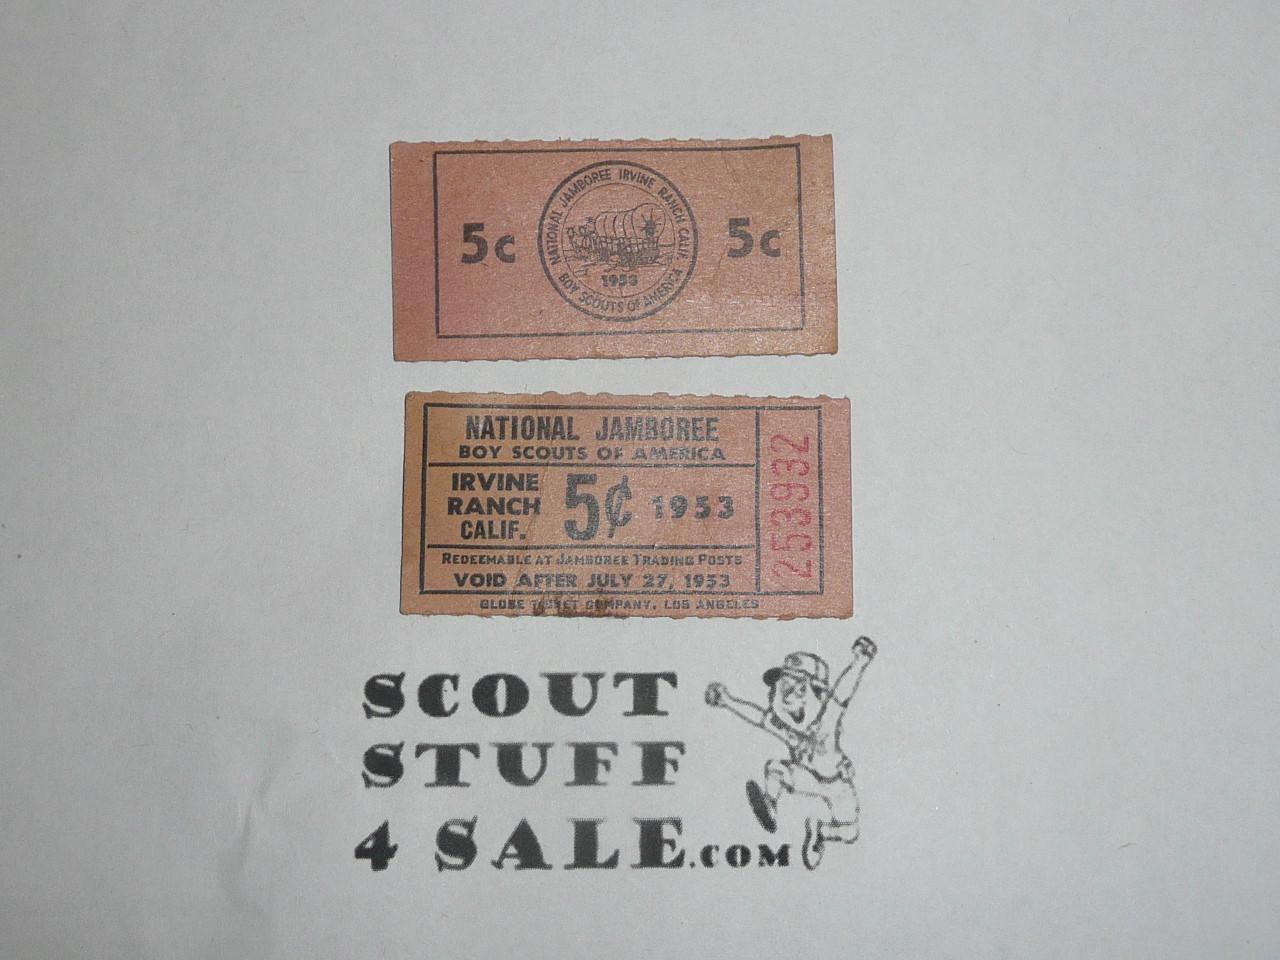 1953 National Jamboree 5 cent Trading Post Ticket